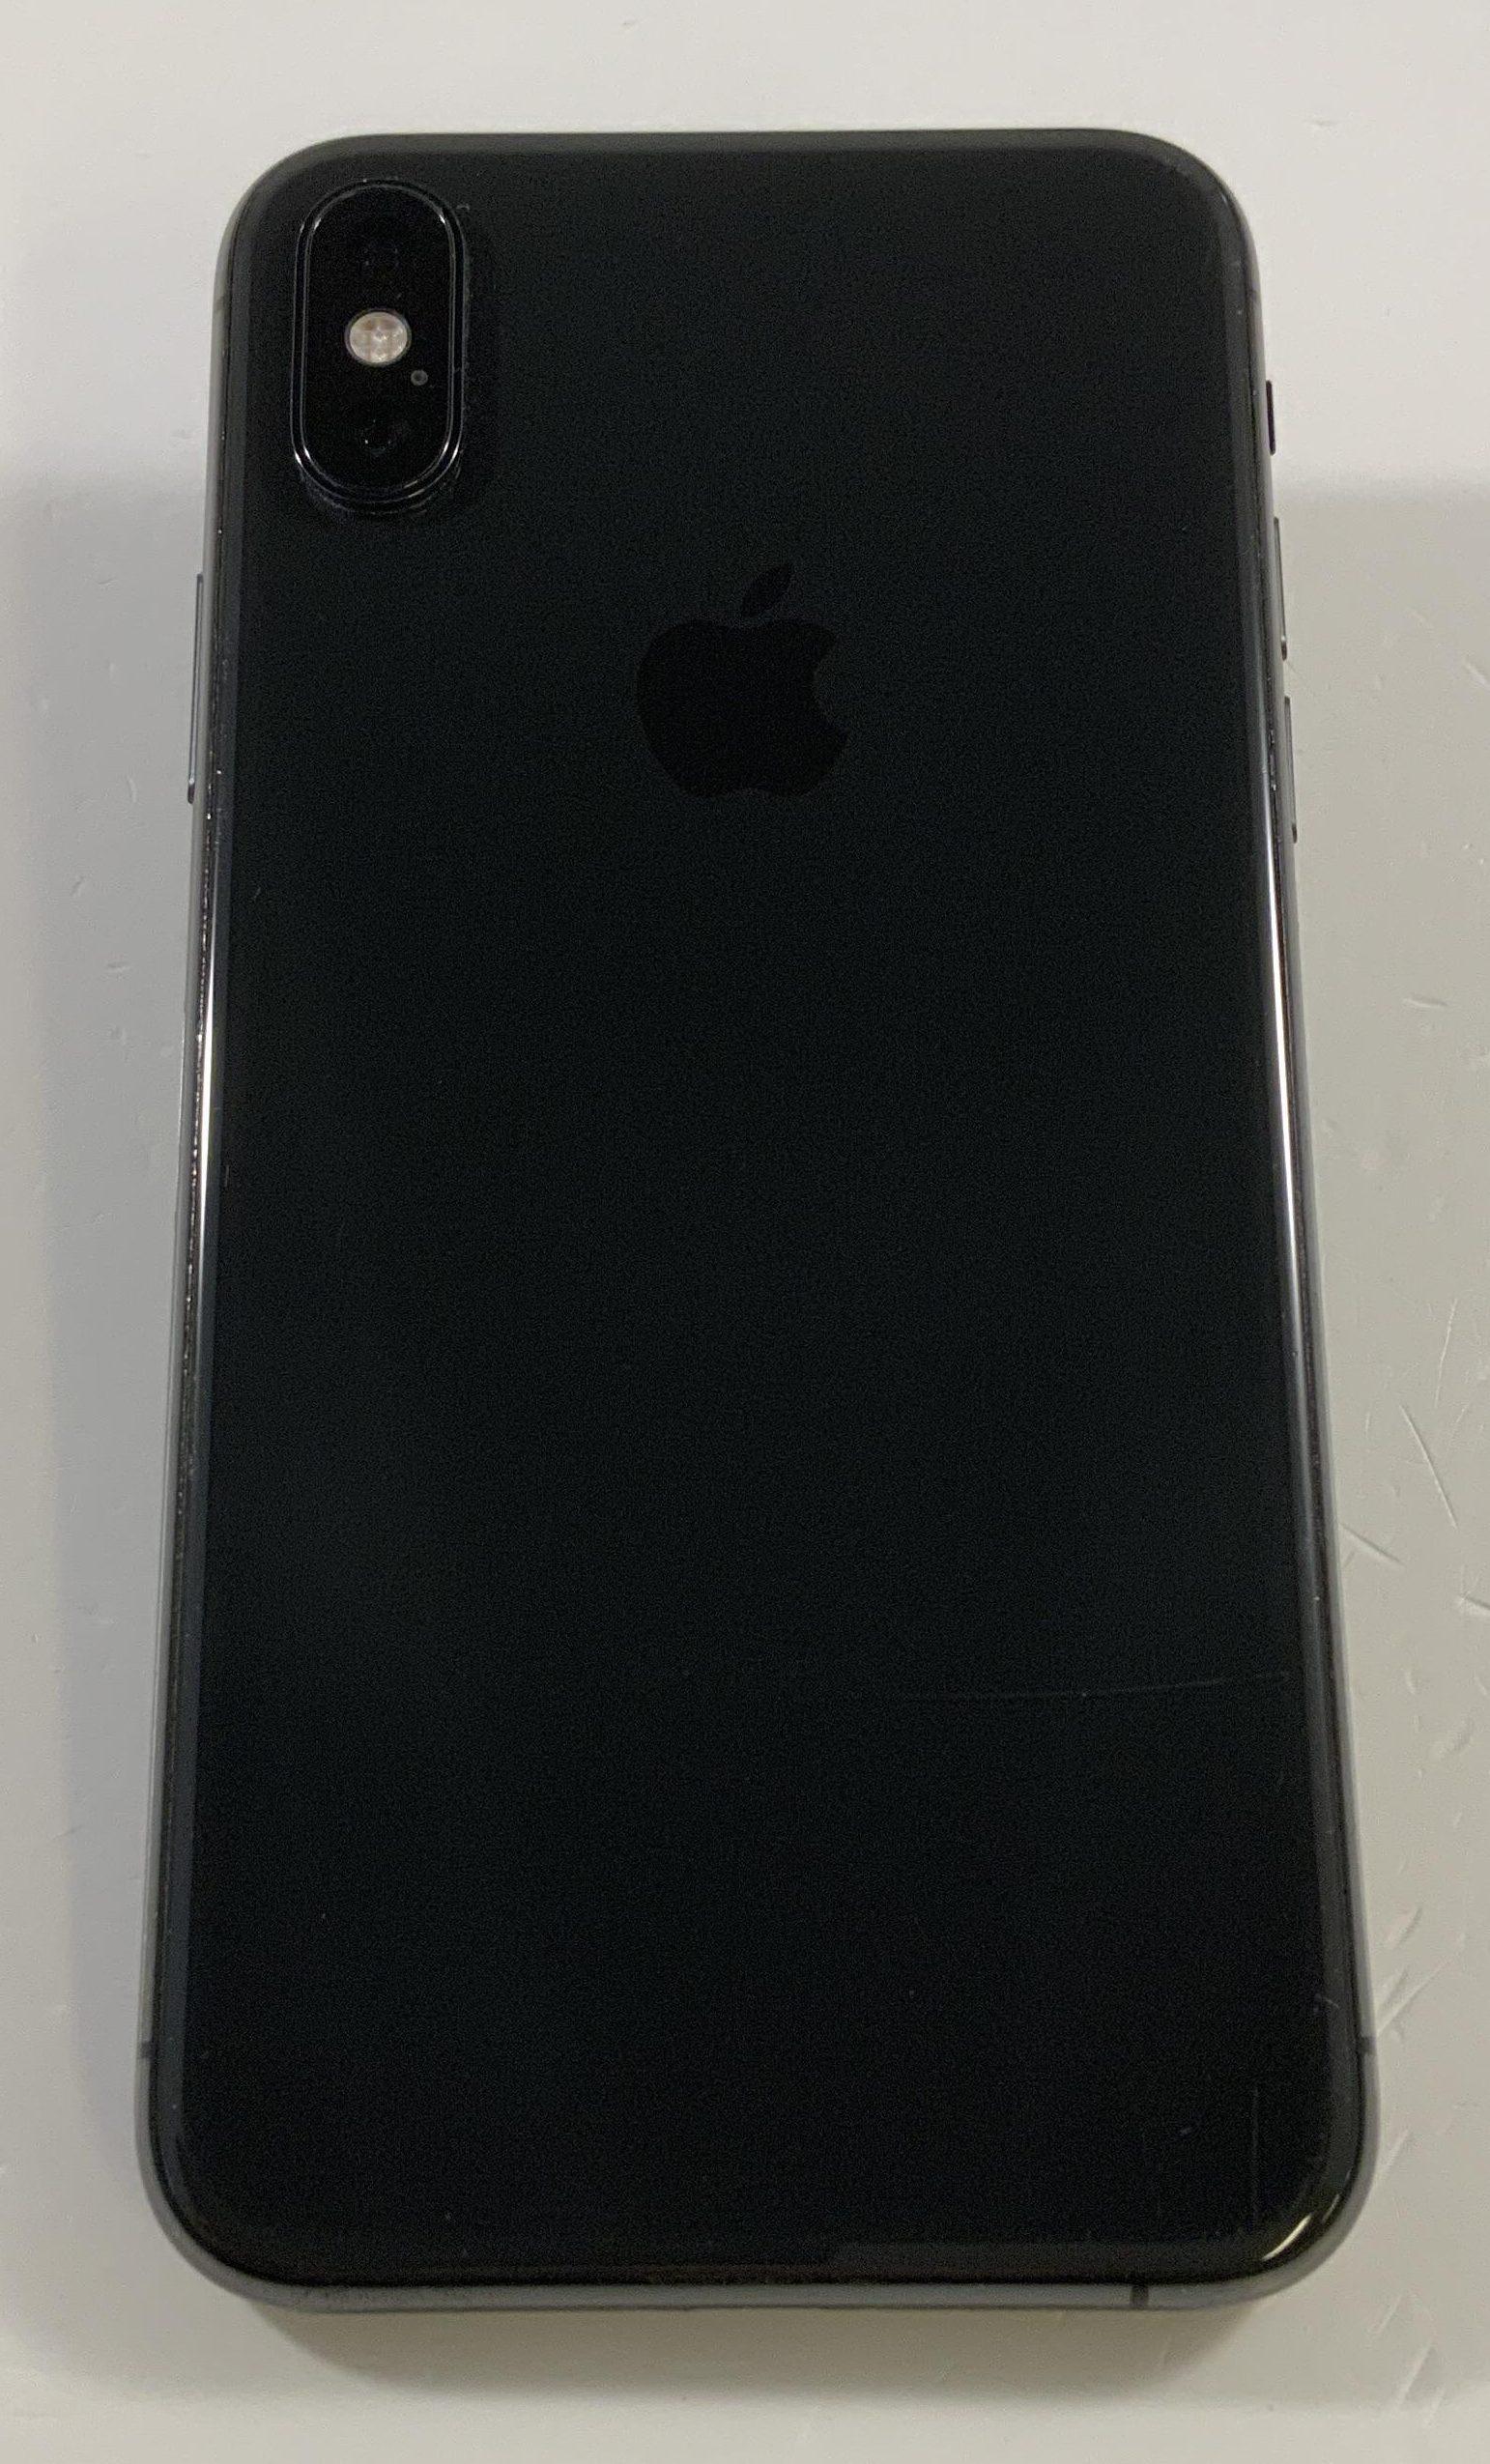 iPhone XS 64GB, 64GB, Space Gray, immagine 2